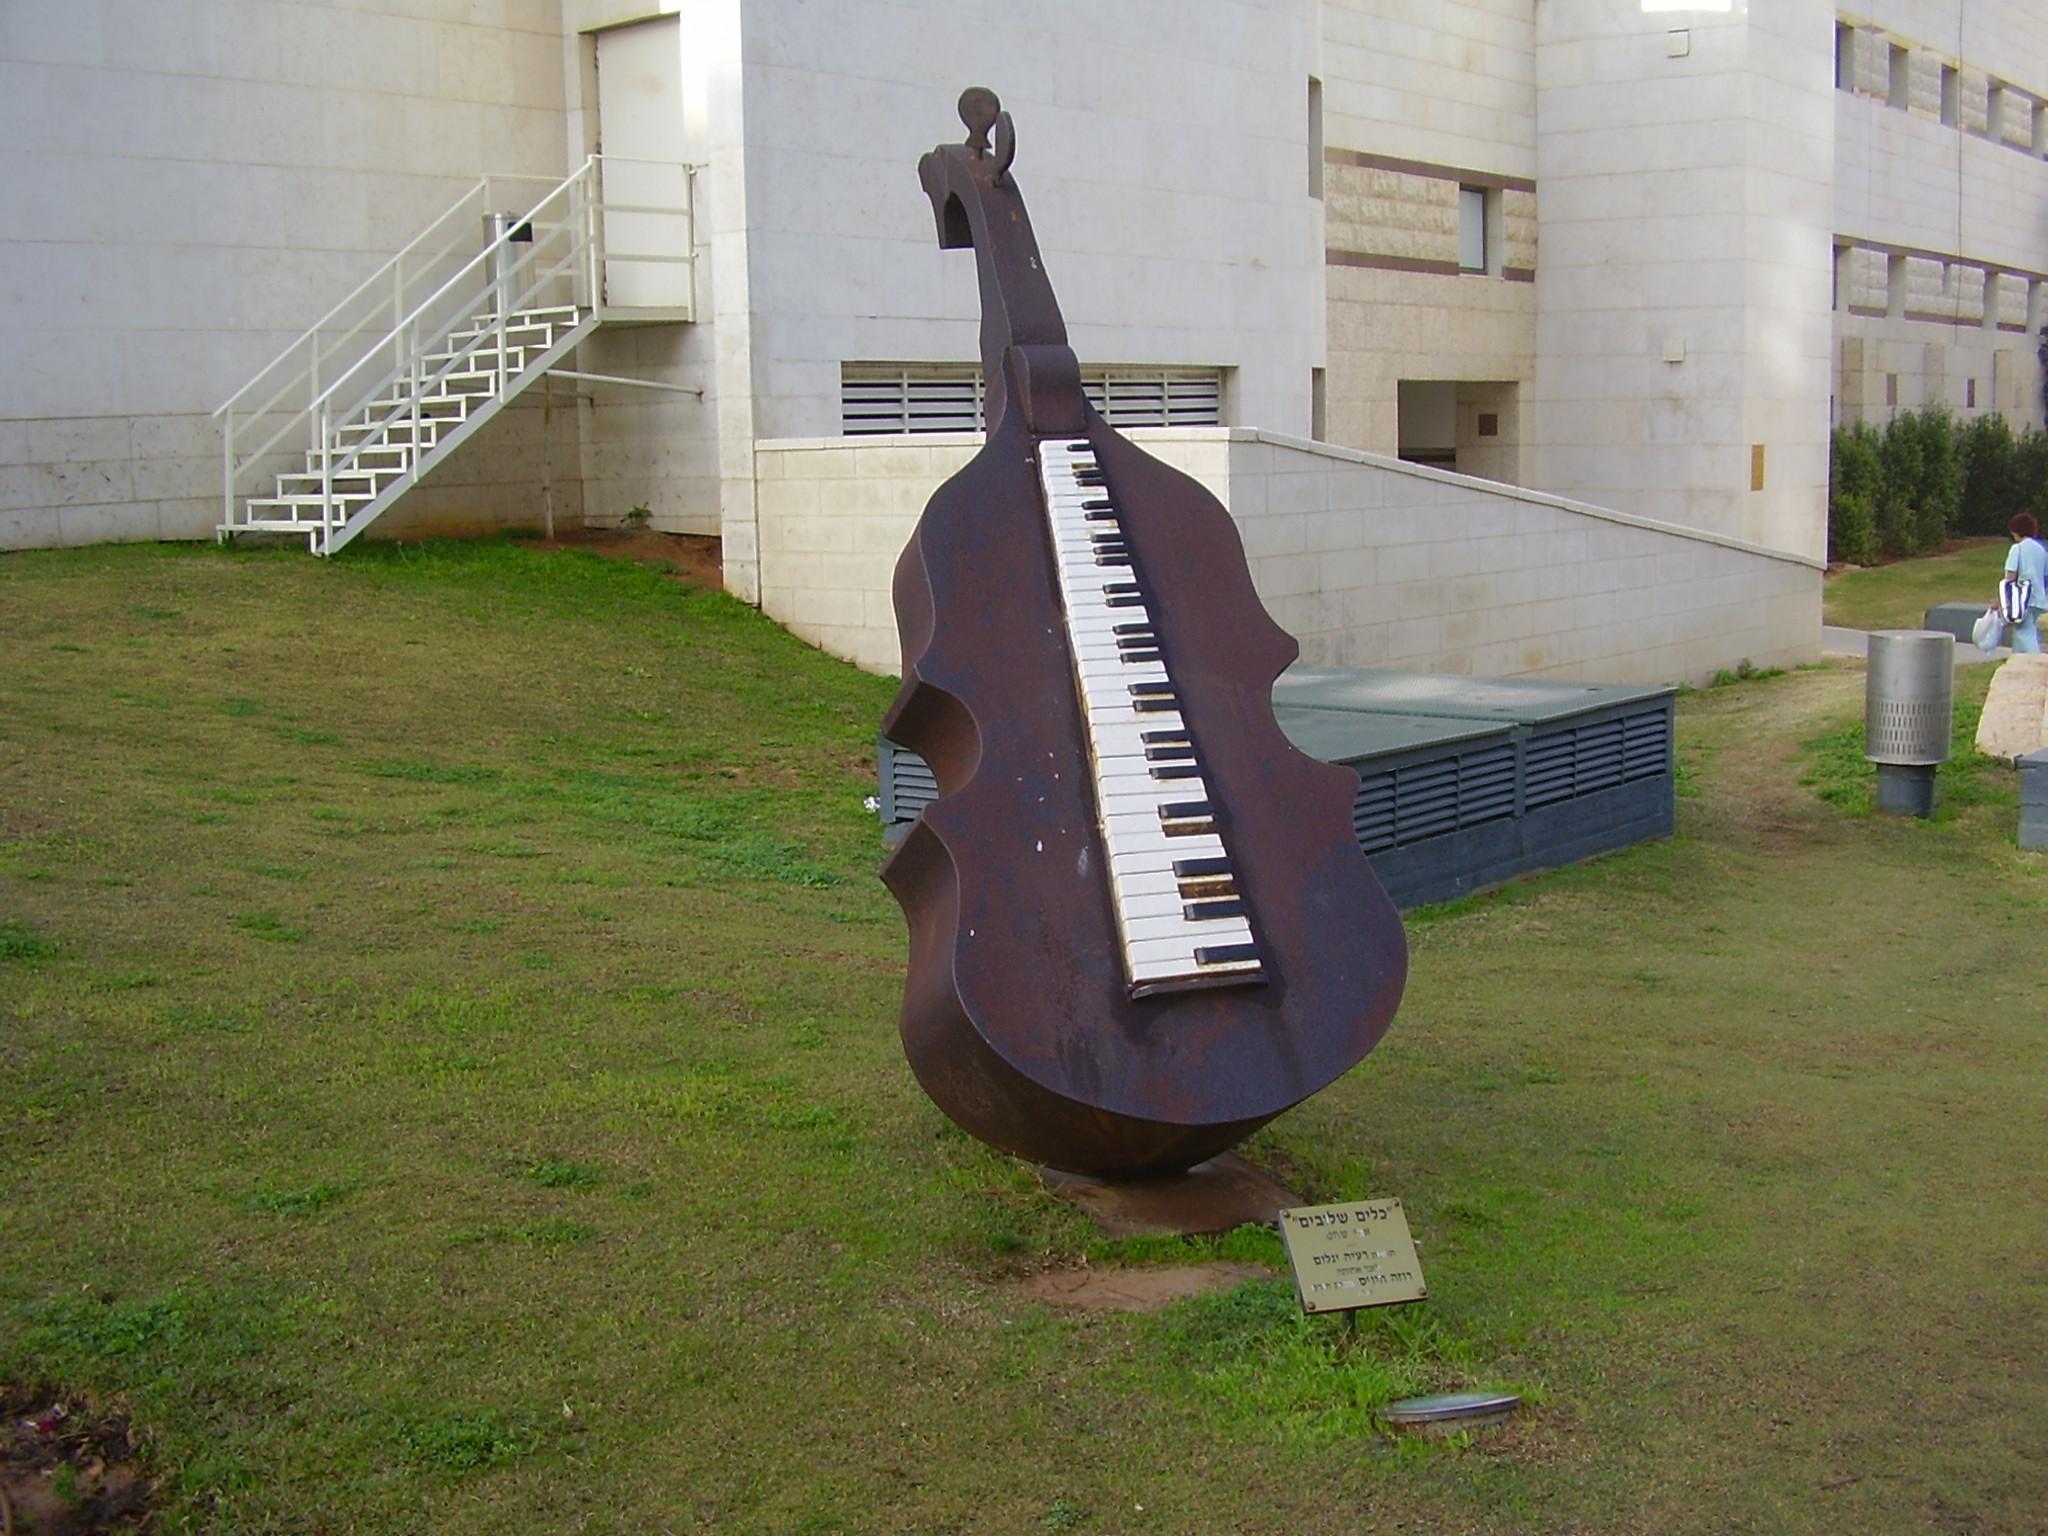 Filepikiwiki Israel 7686 Music Instrumentsjpg Wikimedia Commons